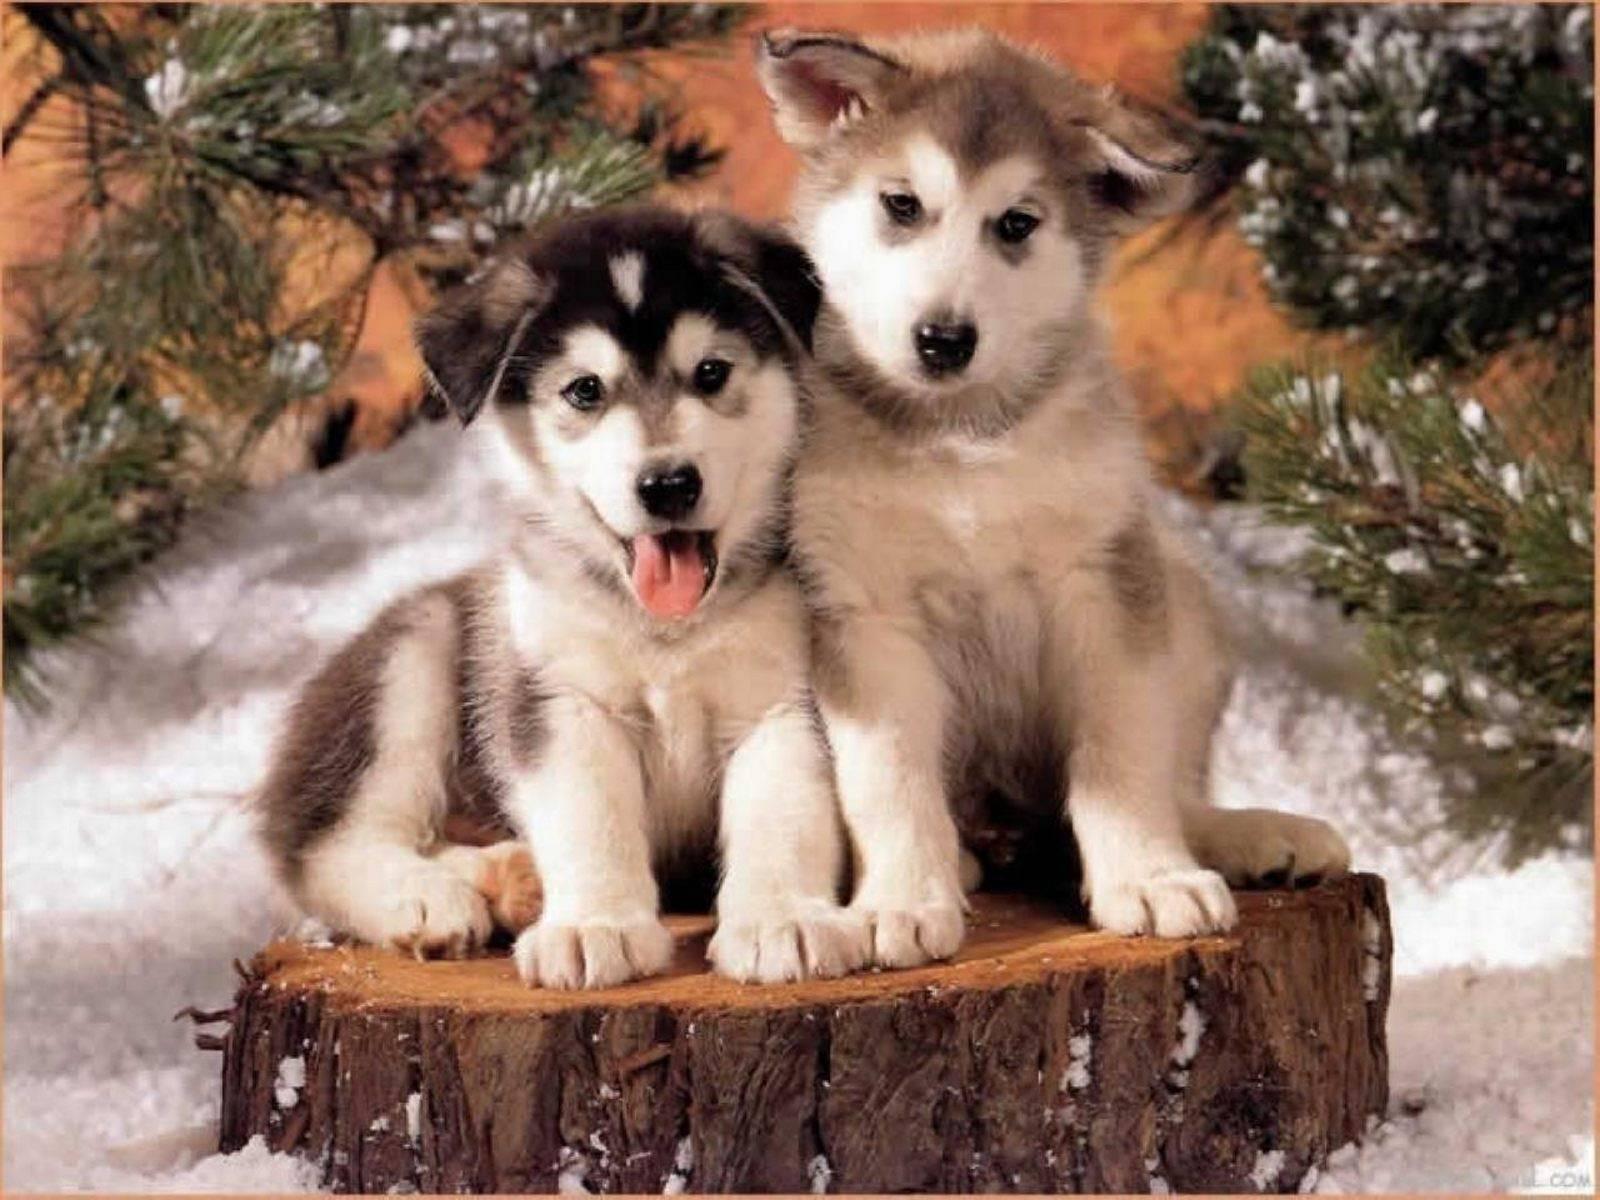 Husky cute puppies   Husky Wallpaper 1600x1200